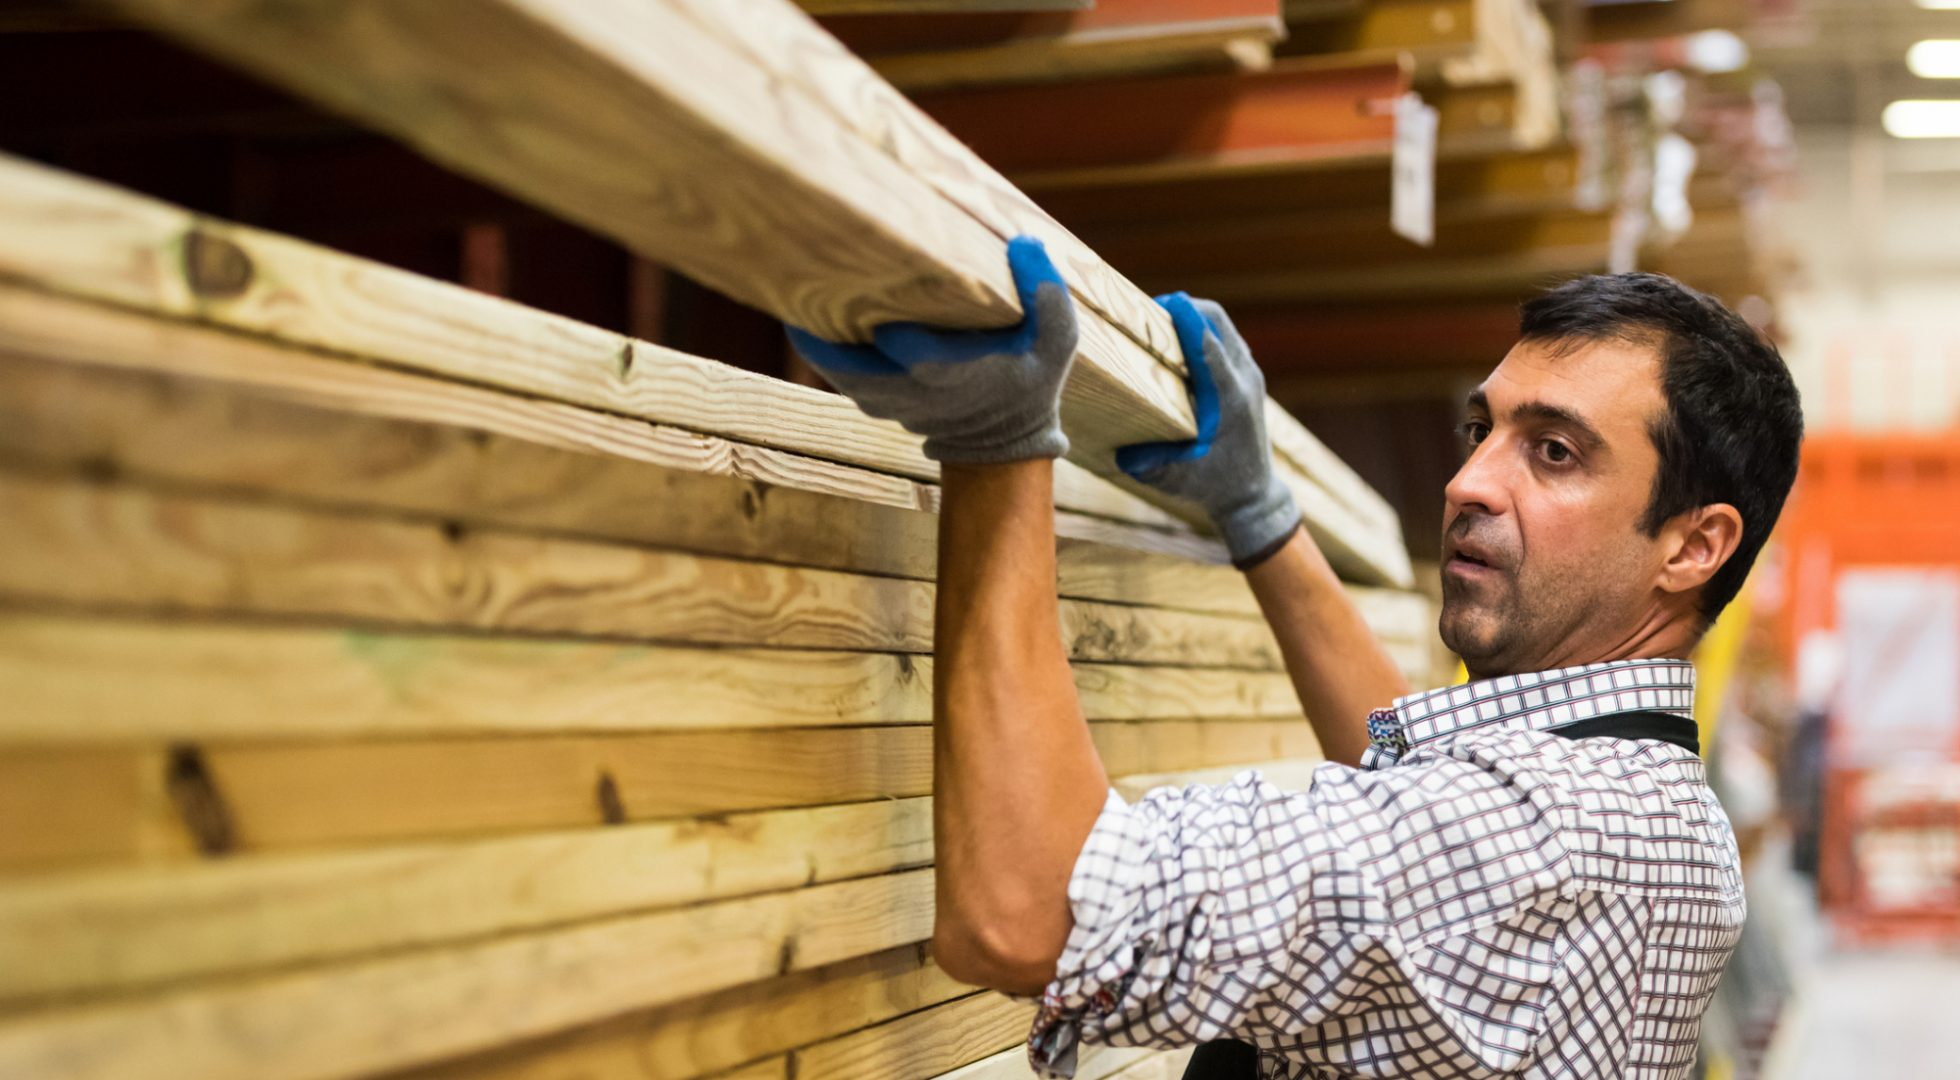 Man working at a lumber warehouse